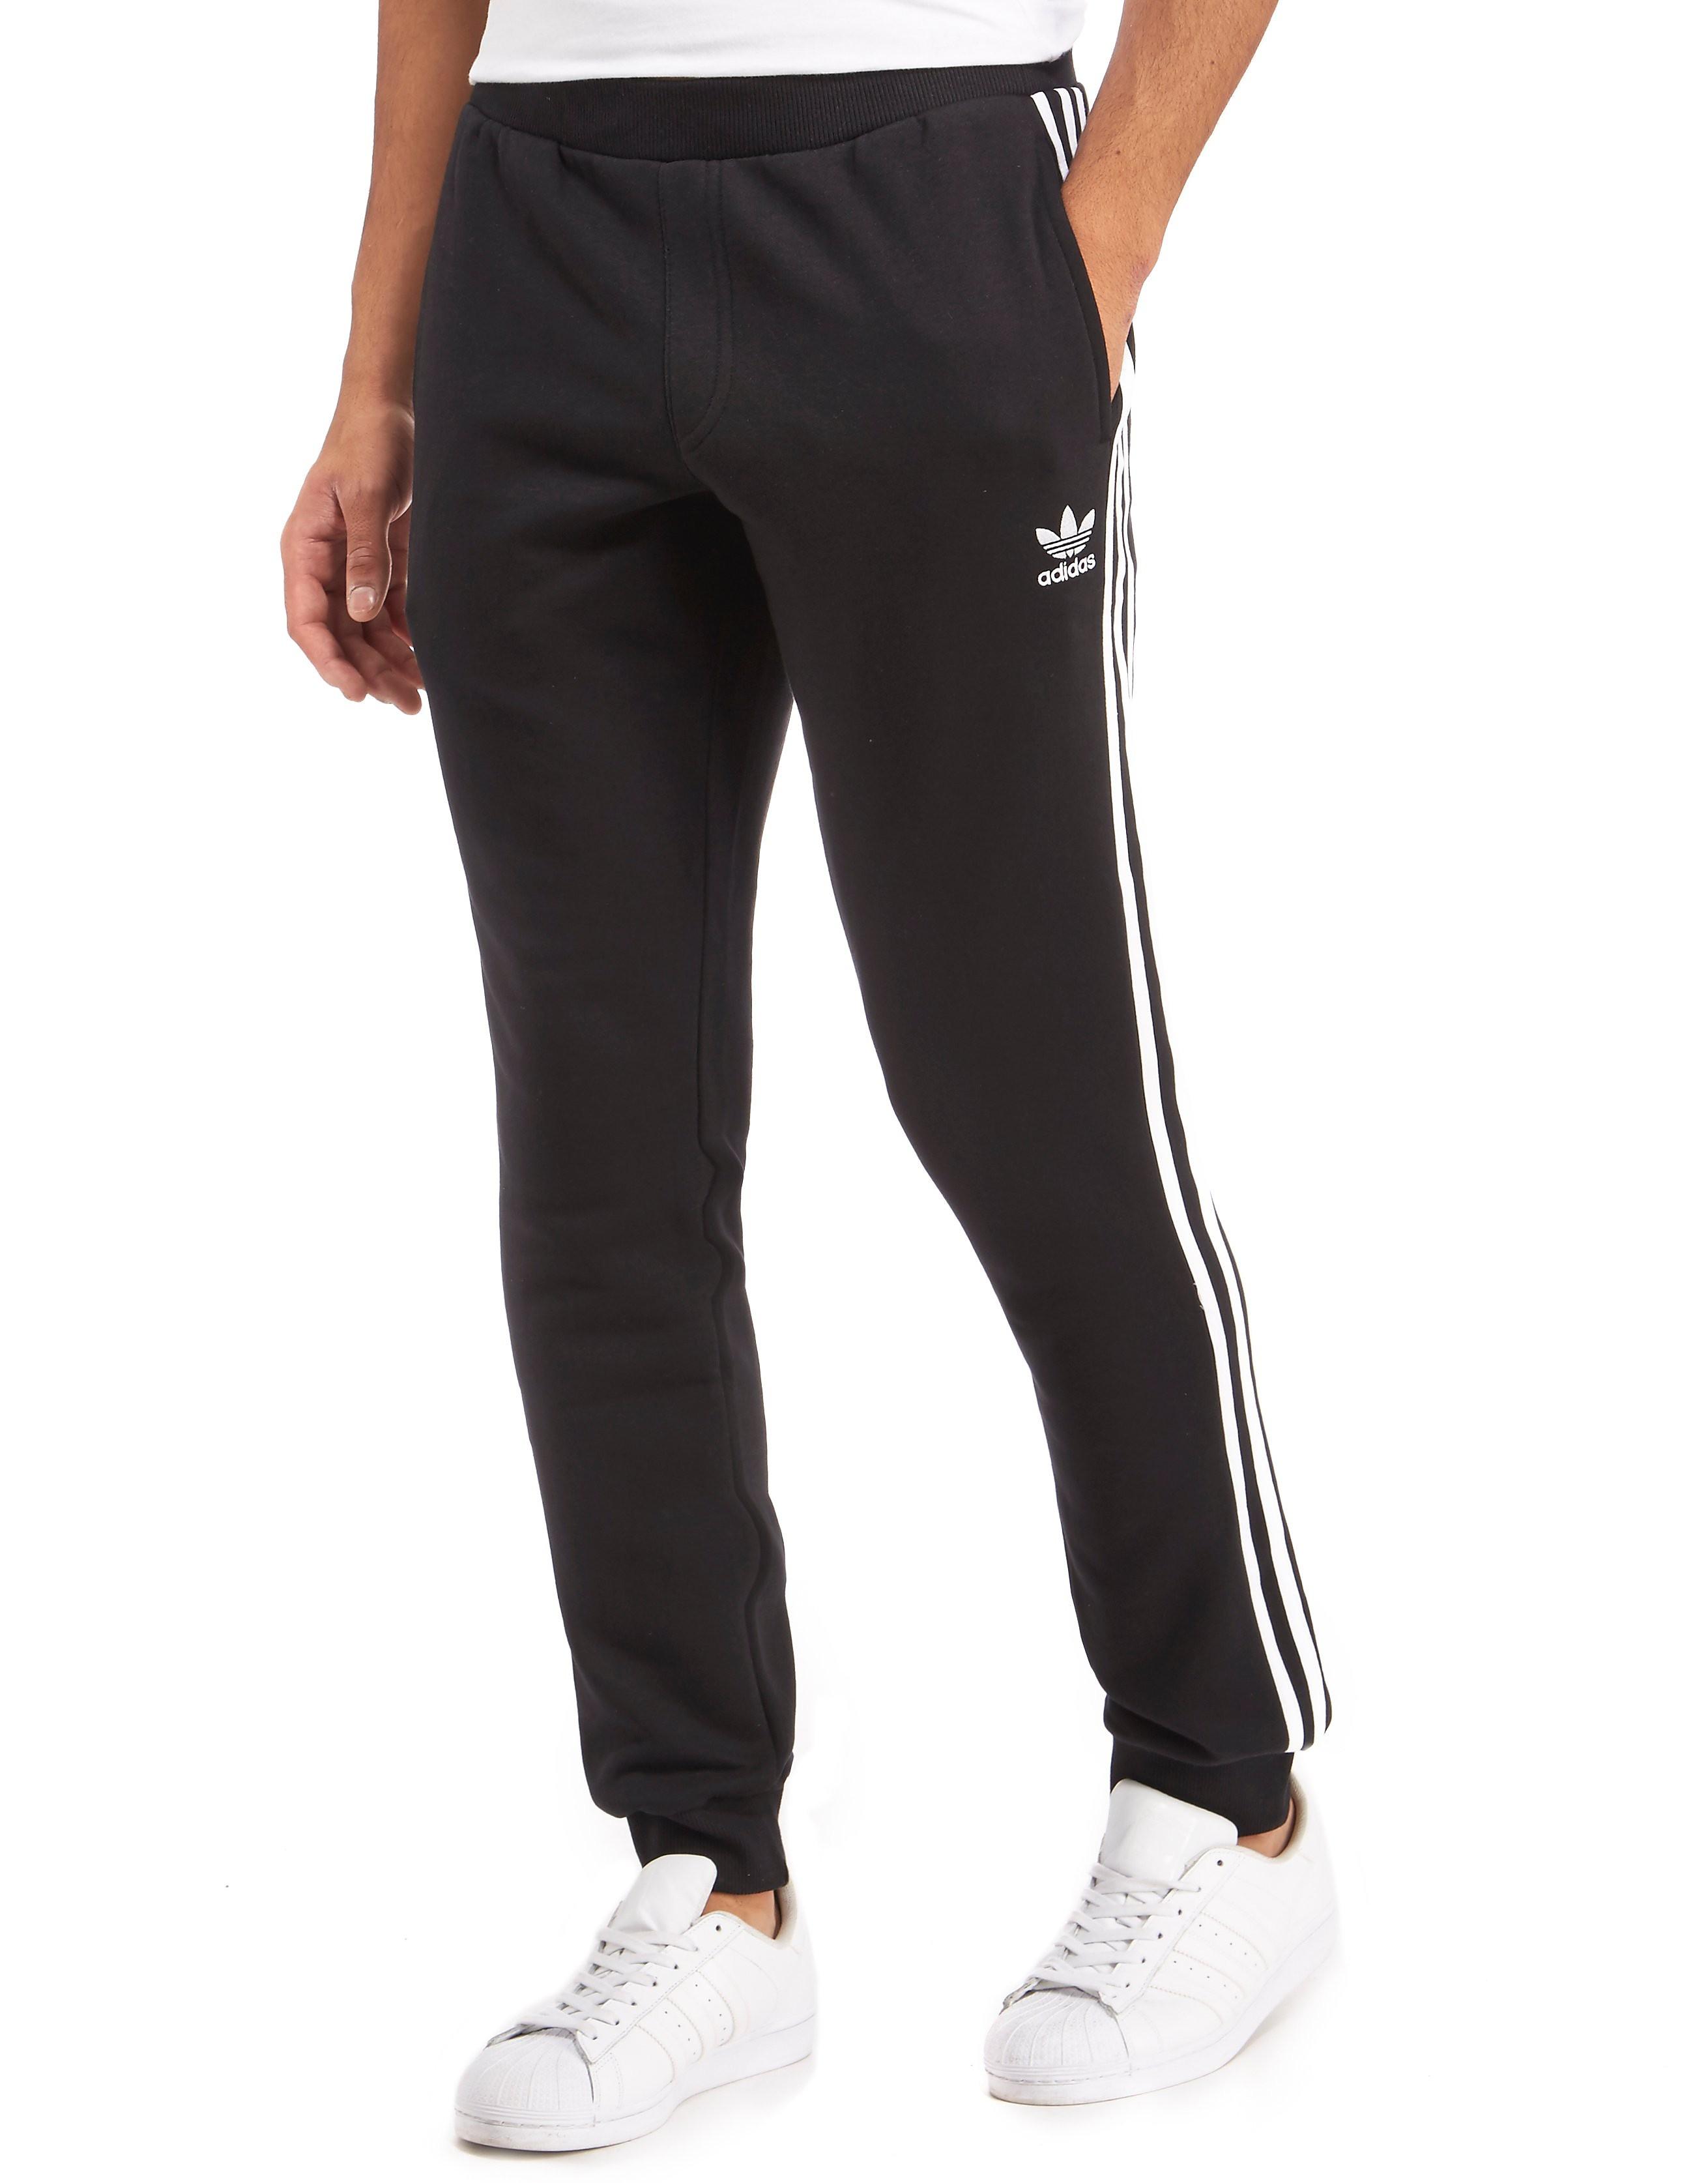 adidas Originals Cuff Pants